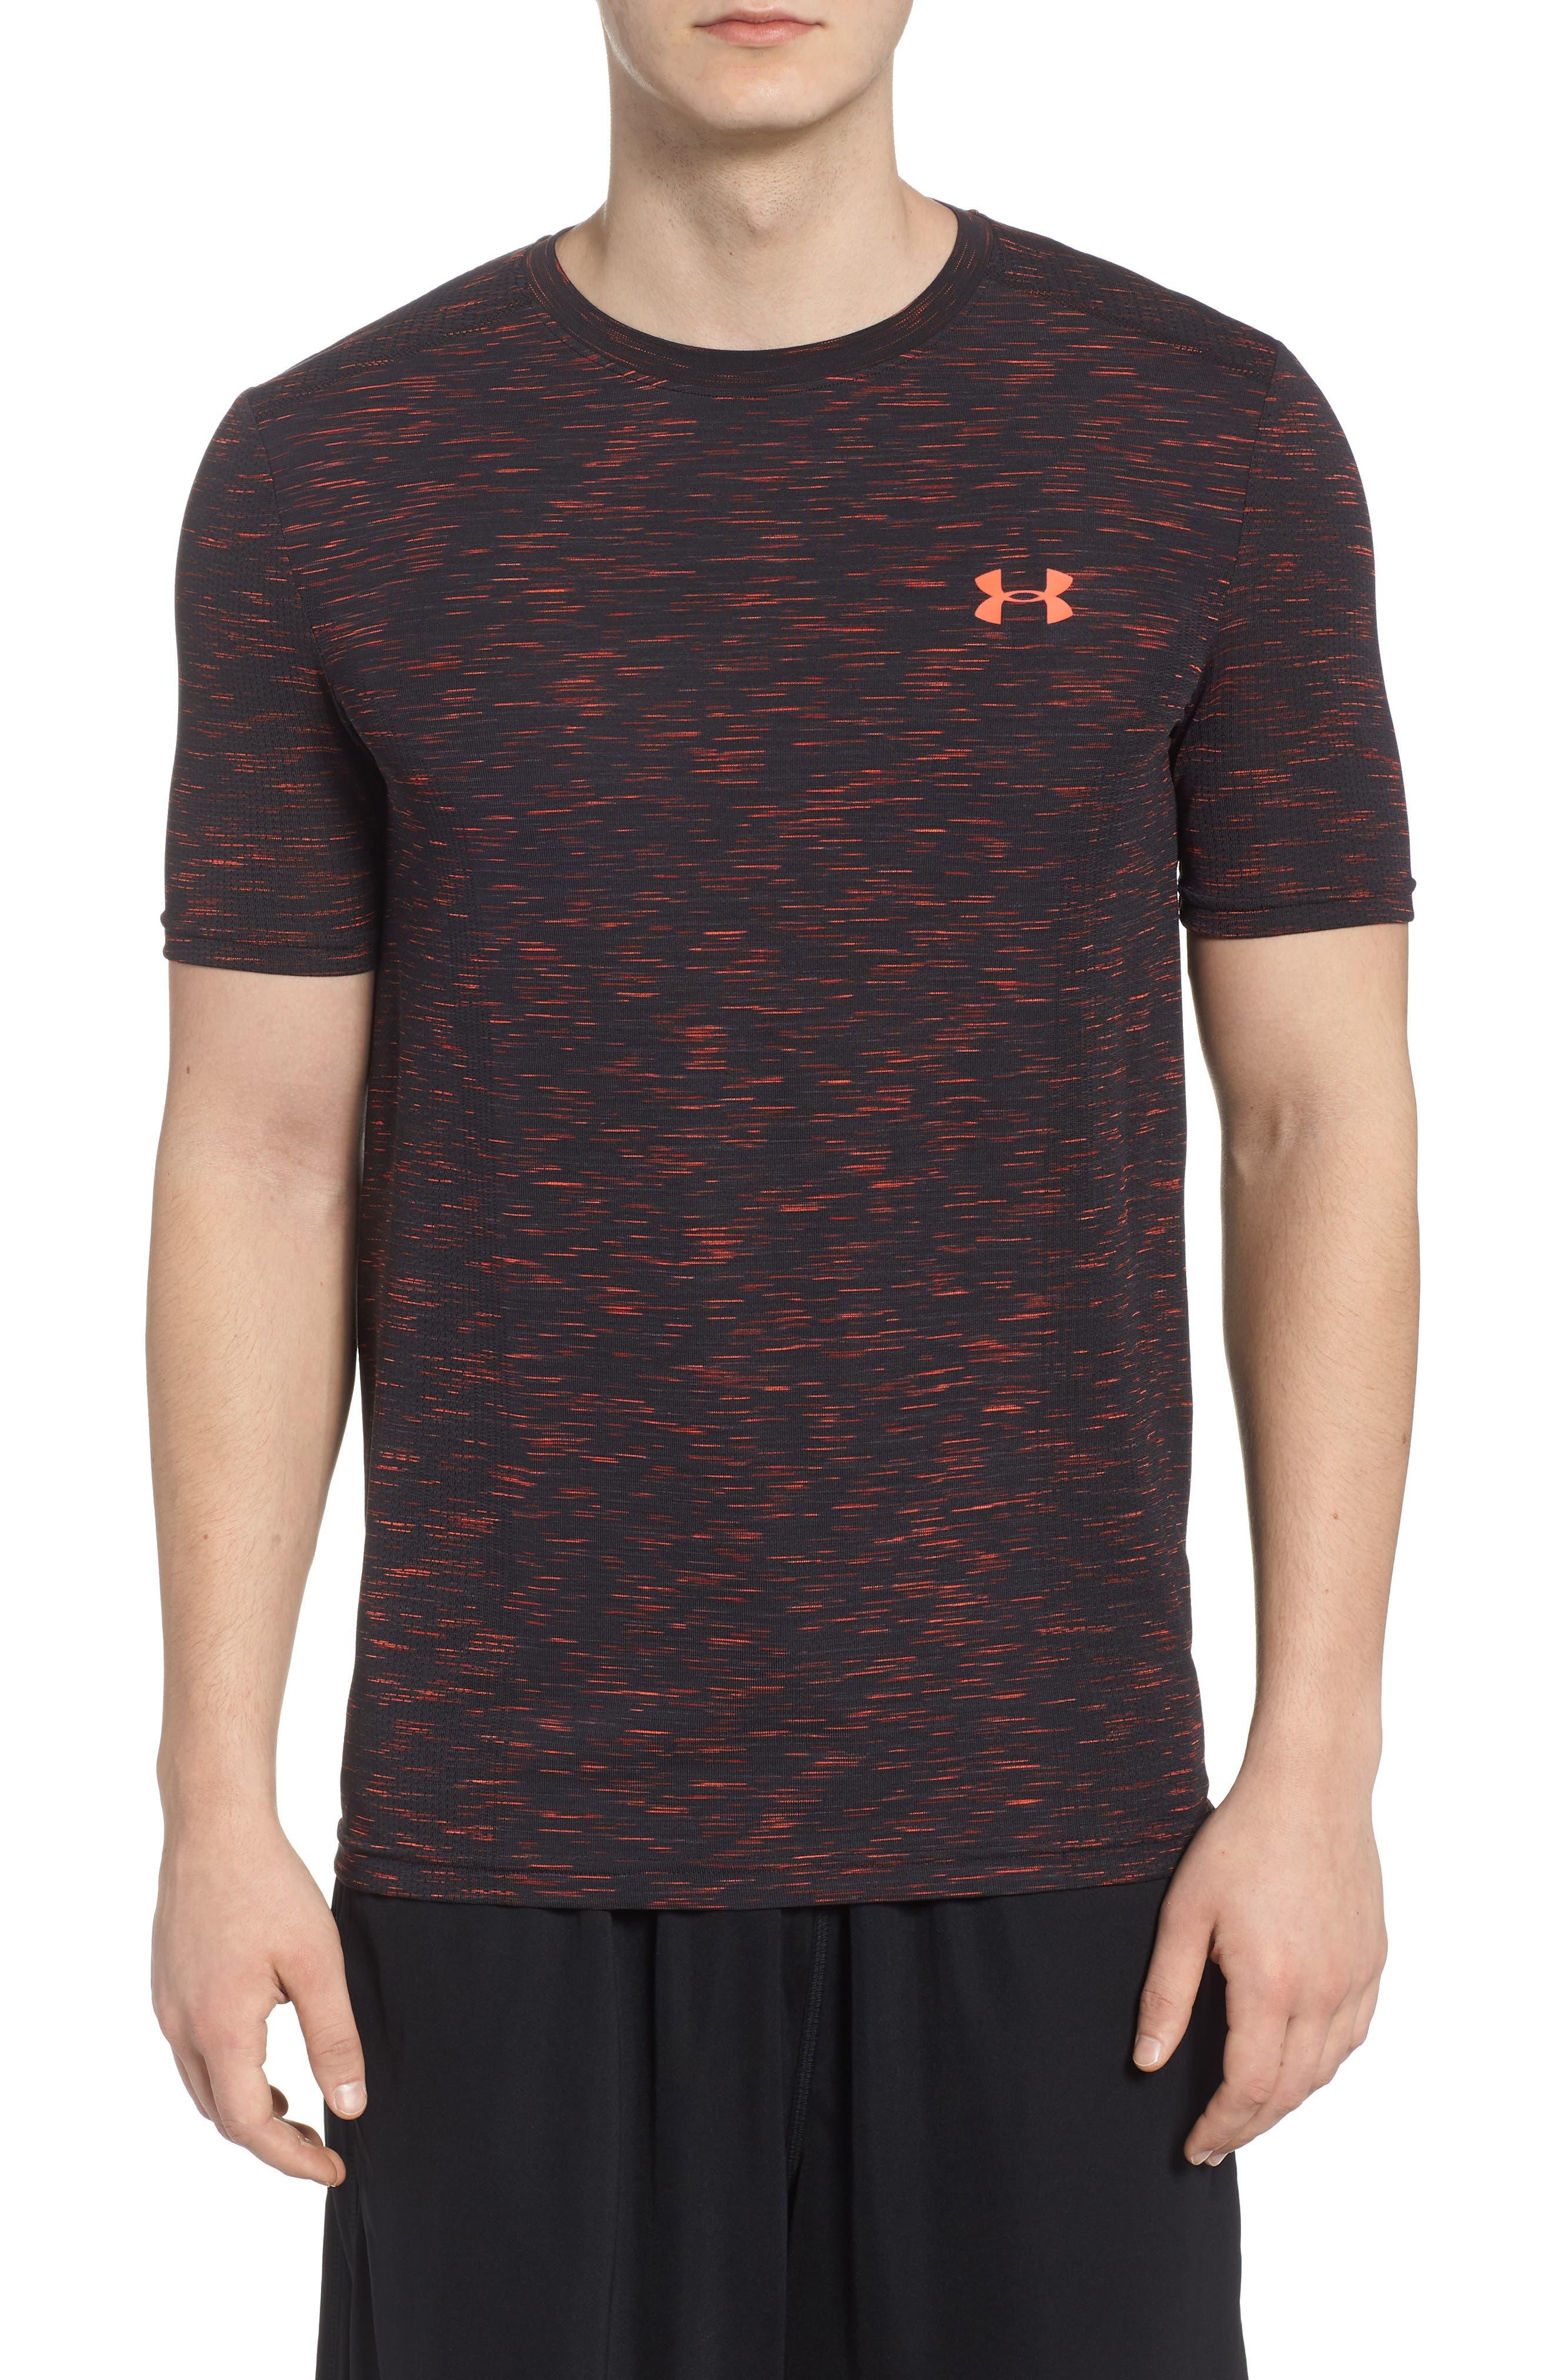 Threadborne Regular Fit T-Shirt,                         Main,                         color, ANTHRACITE/ NEON CORAL